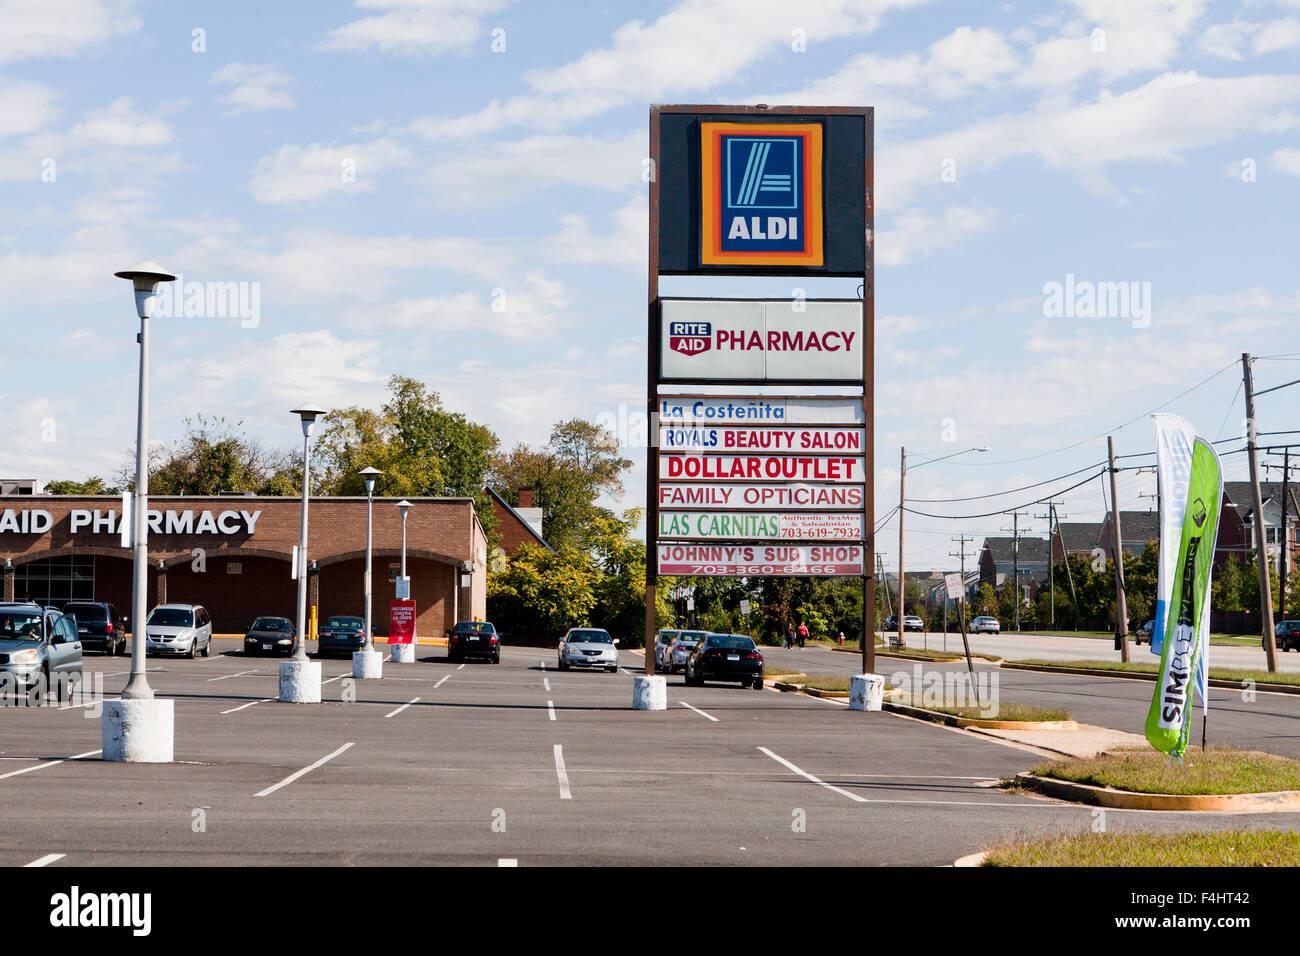 Strip mall store sign - Alexandria, Virginia USA - Stock Image